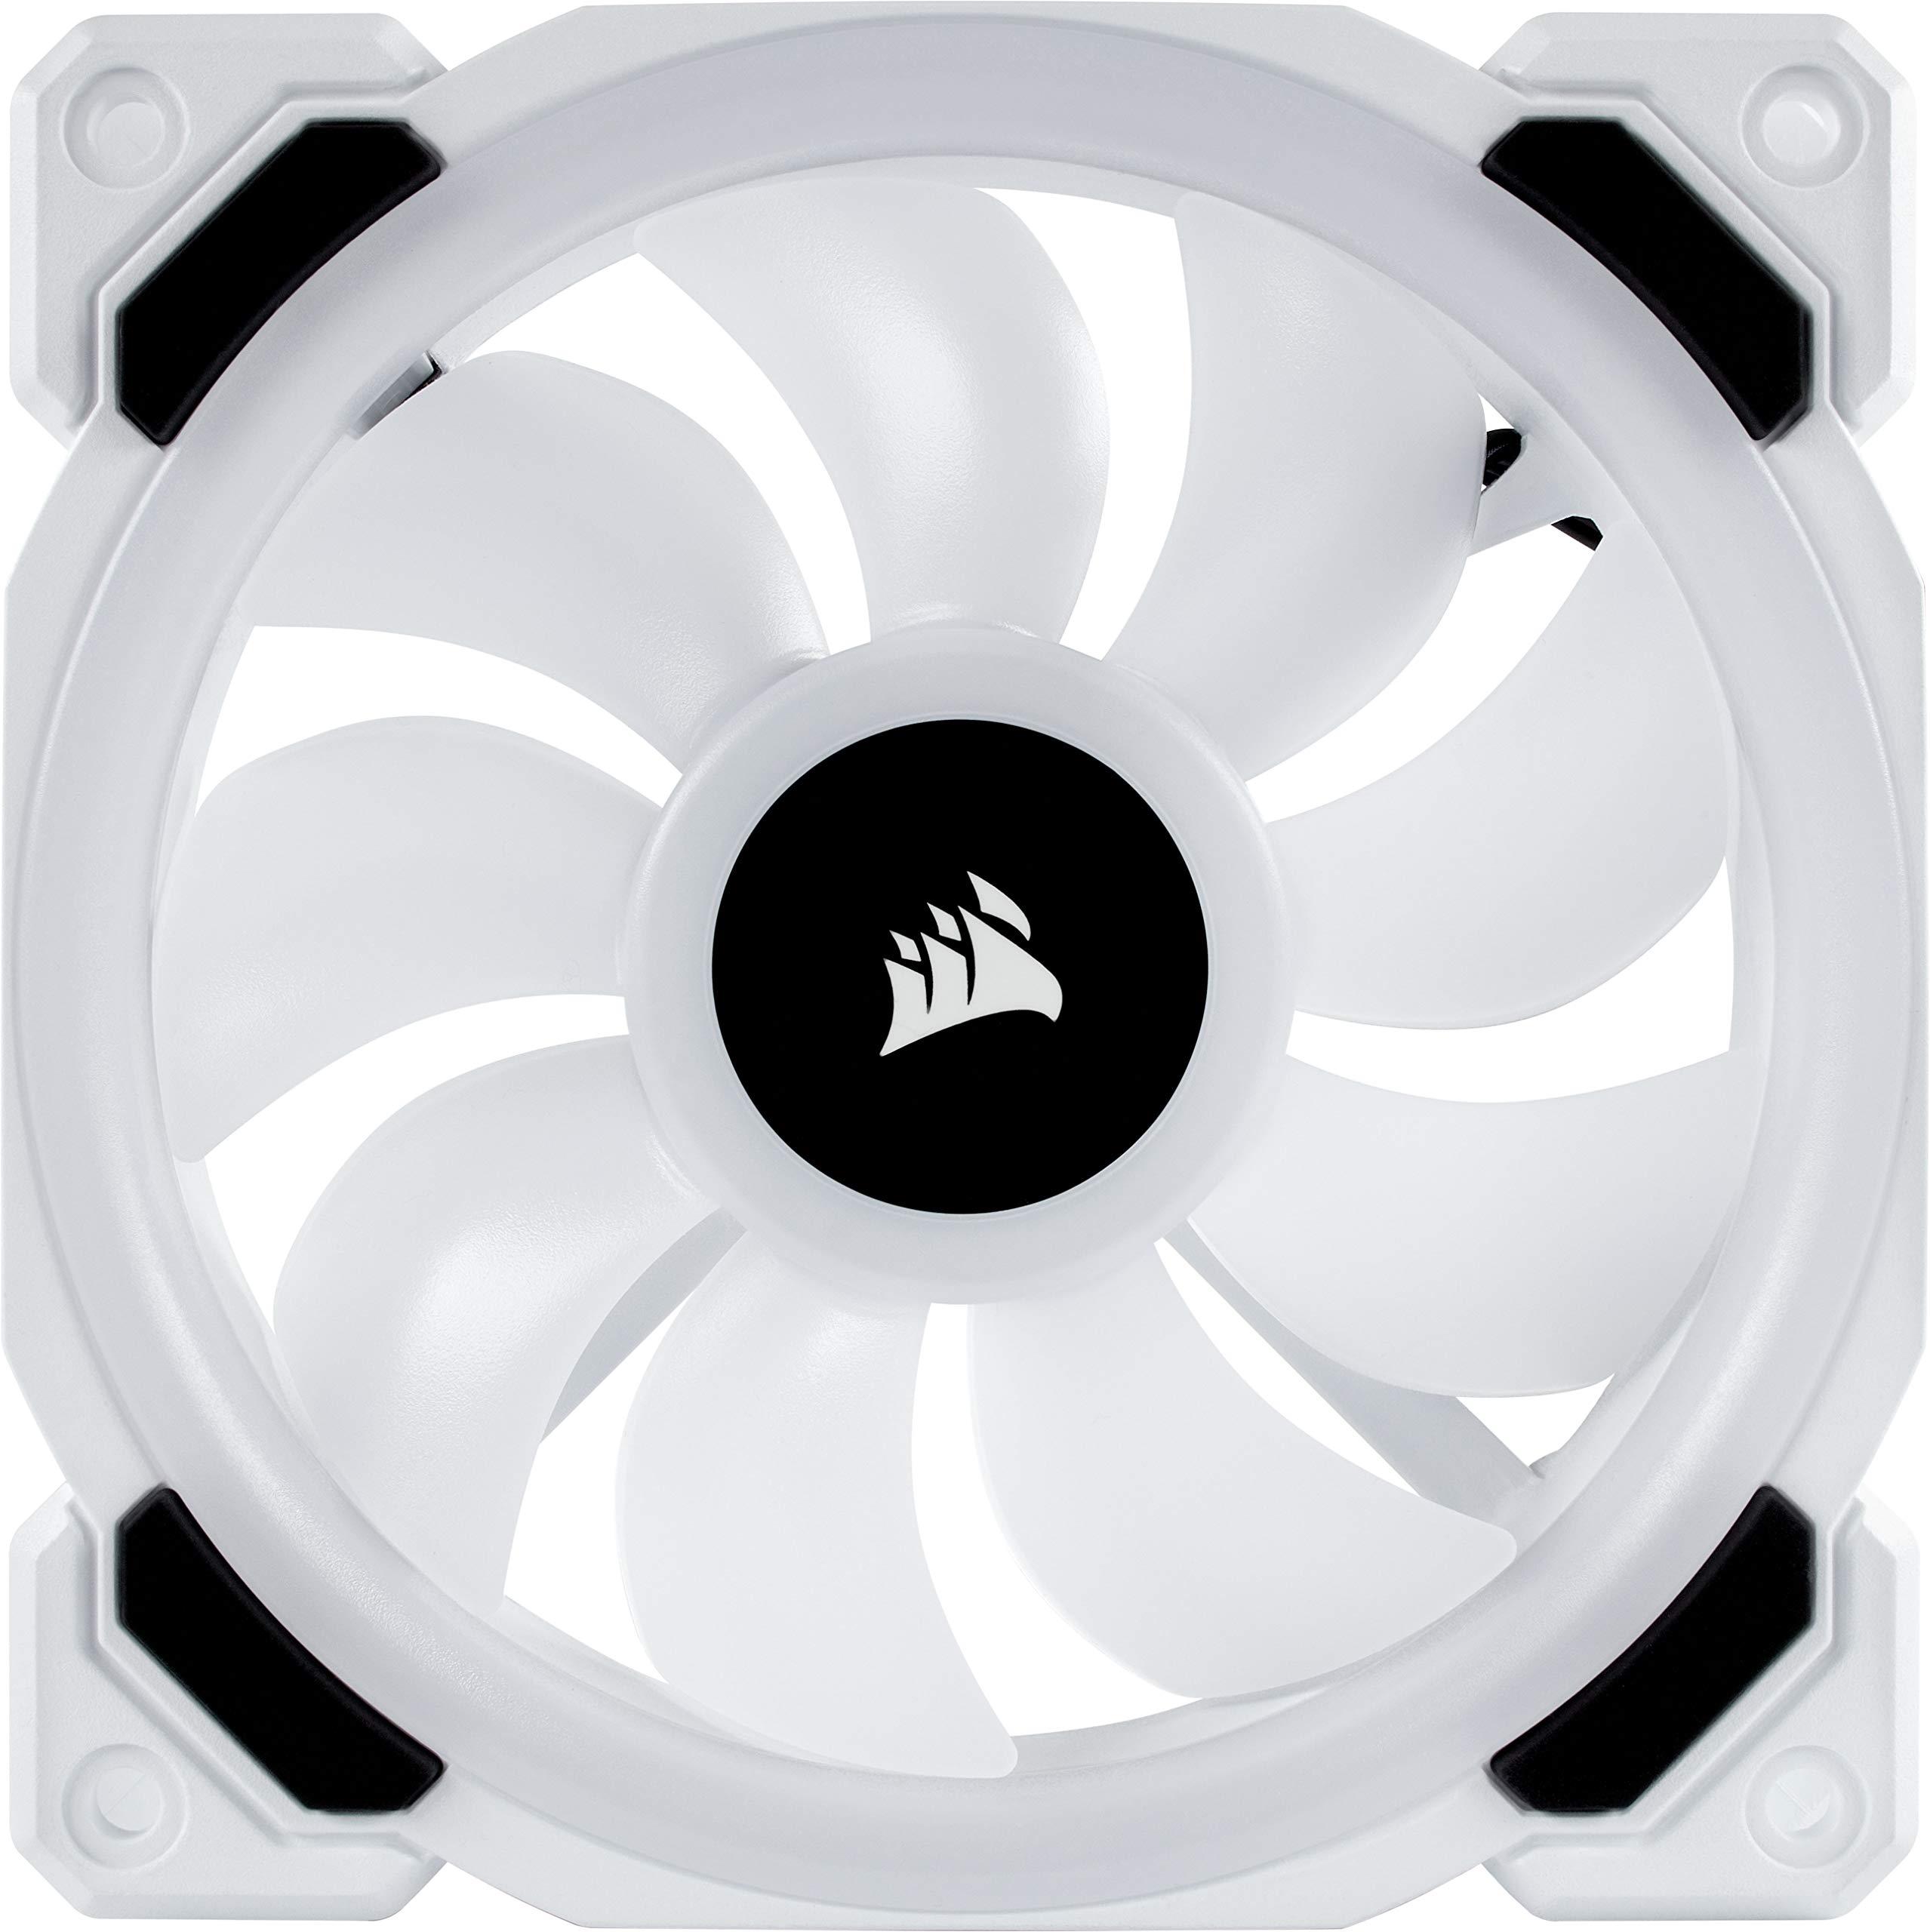 CORSAIR LL Series, LL120 RGB, 120mm RGB LED Fan, Triple Pack with Lighting Node PRO- White by Corsair (Image #17)